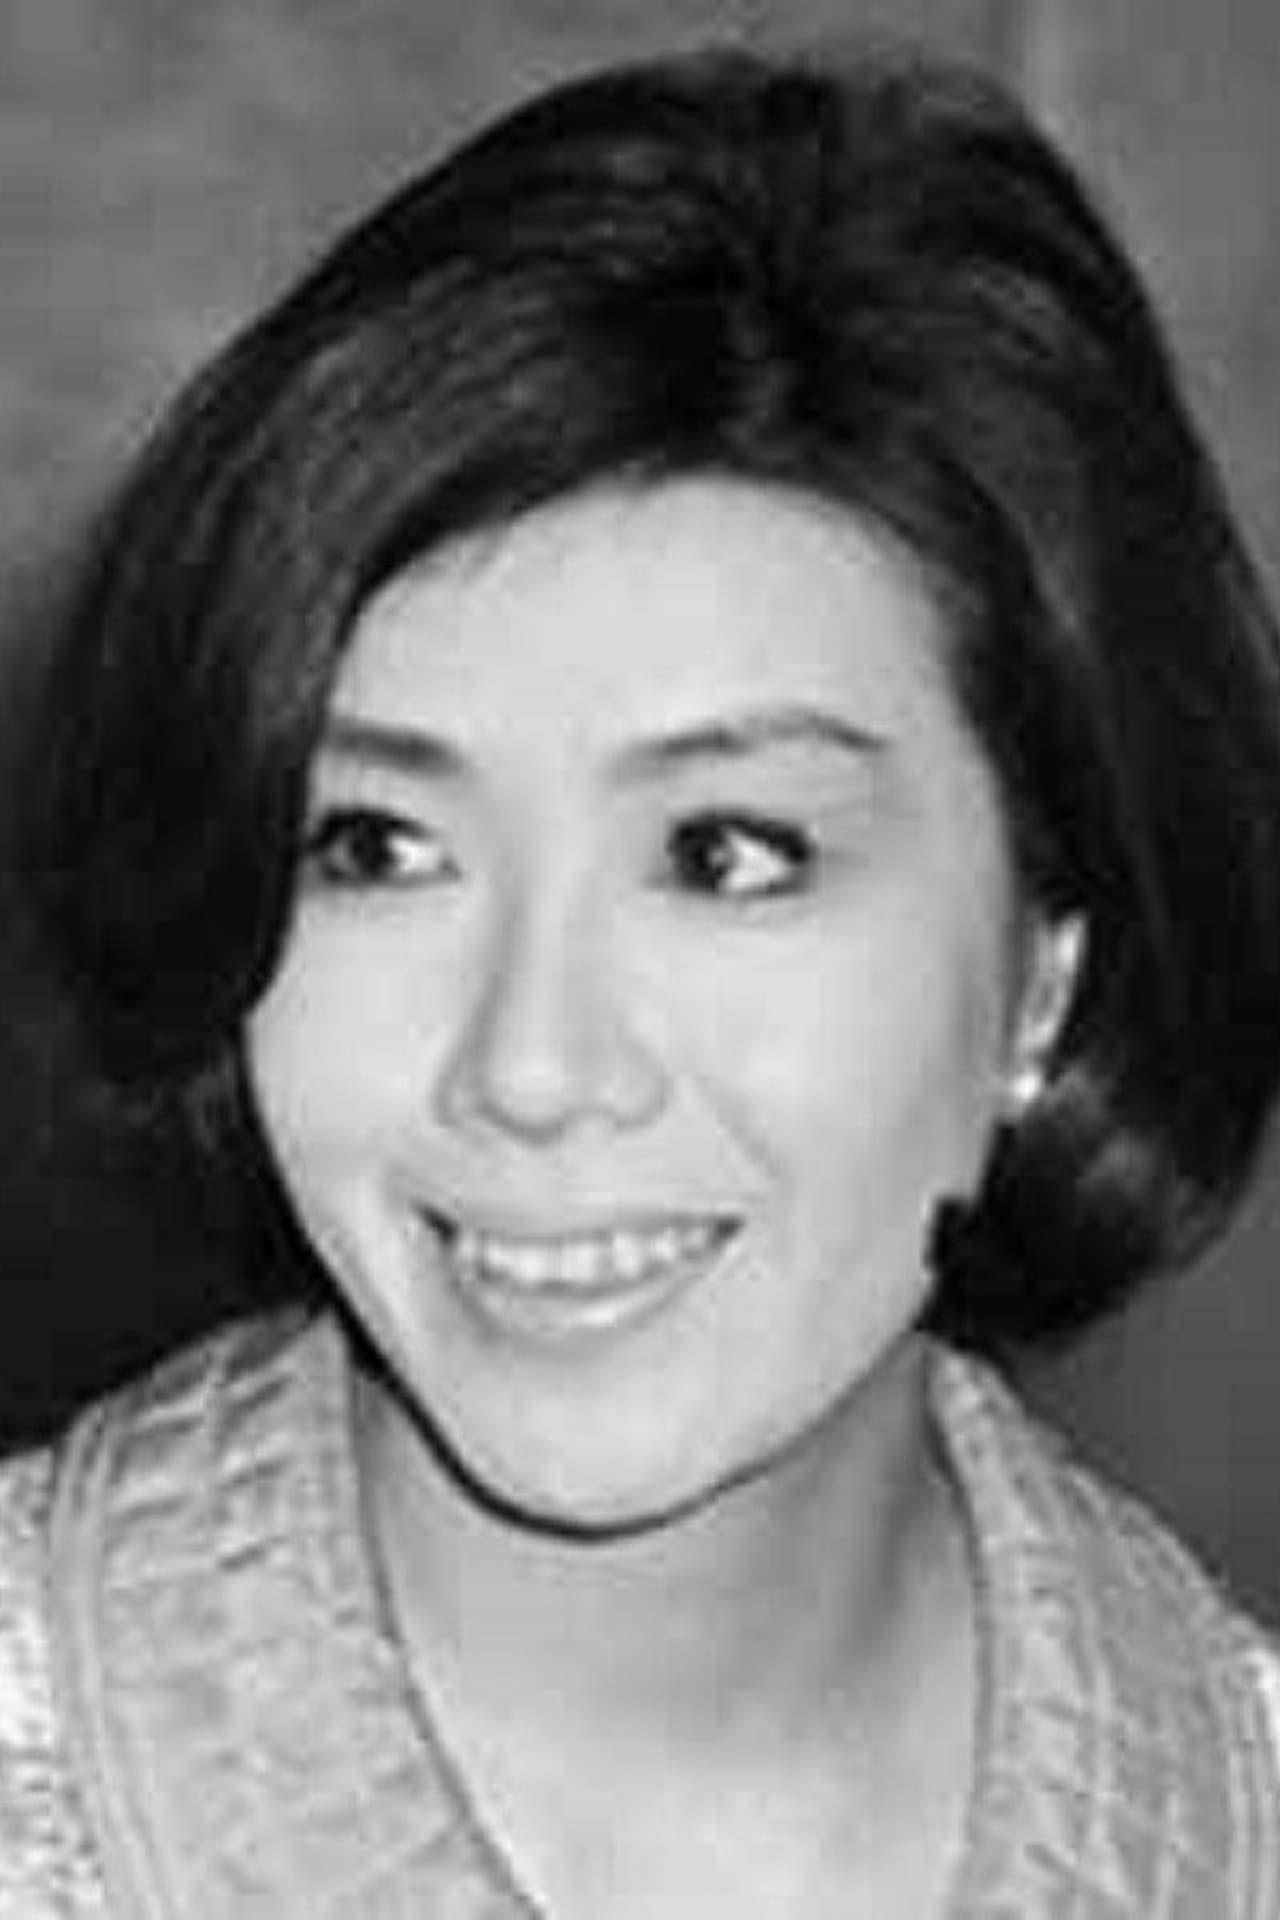 Yukiji Asaoka